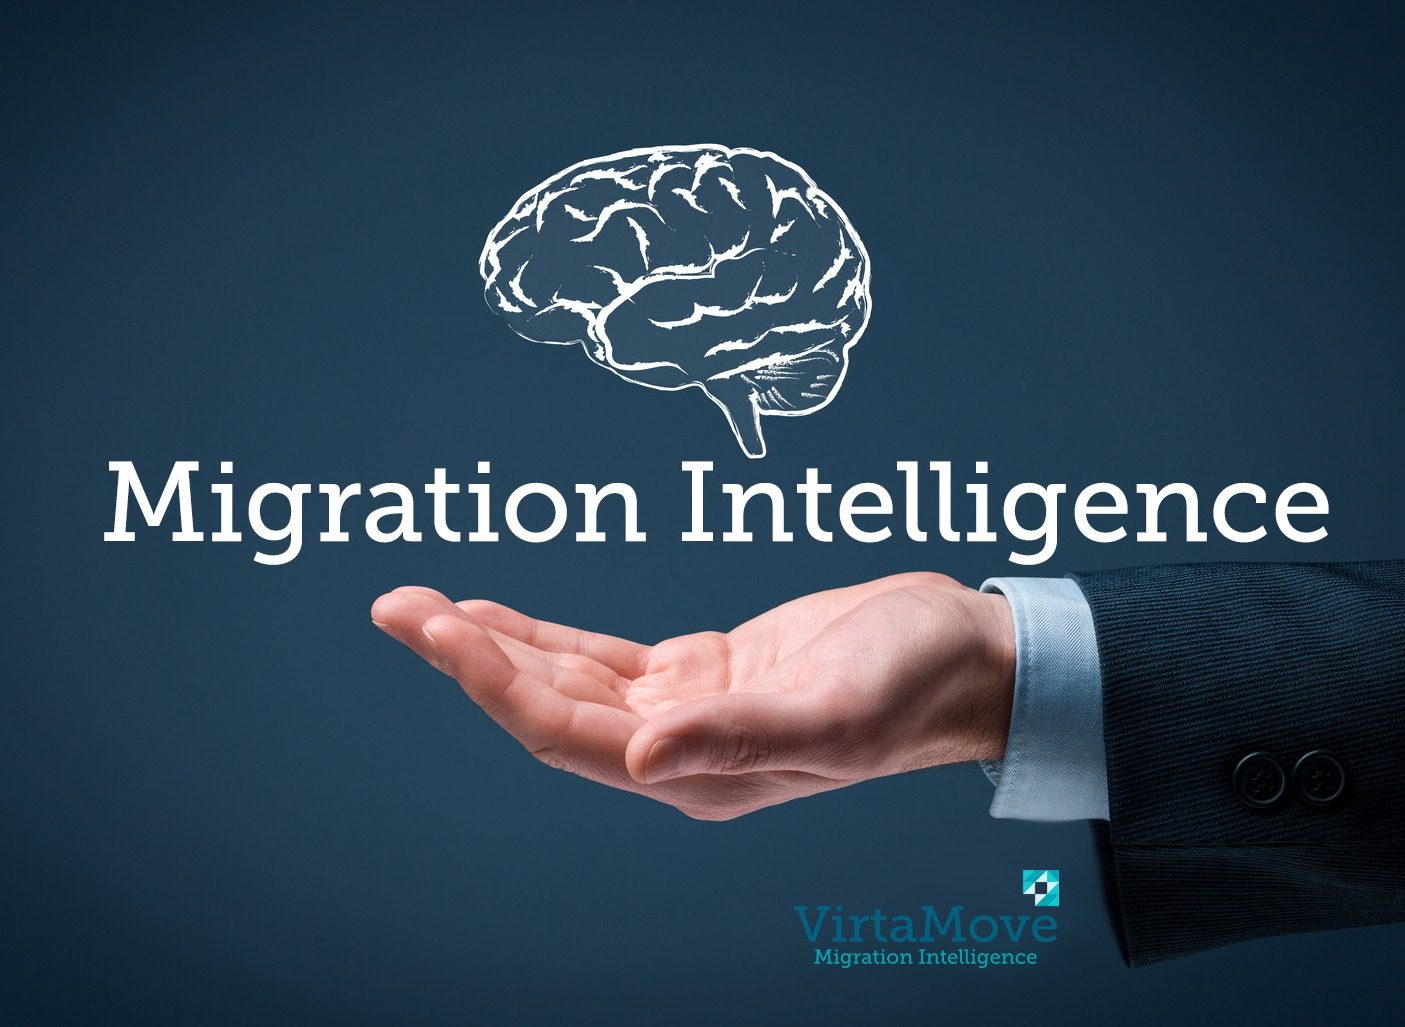 Using VirtaMove to gain Migration Intelligence